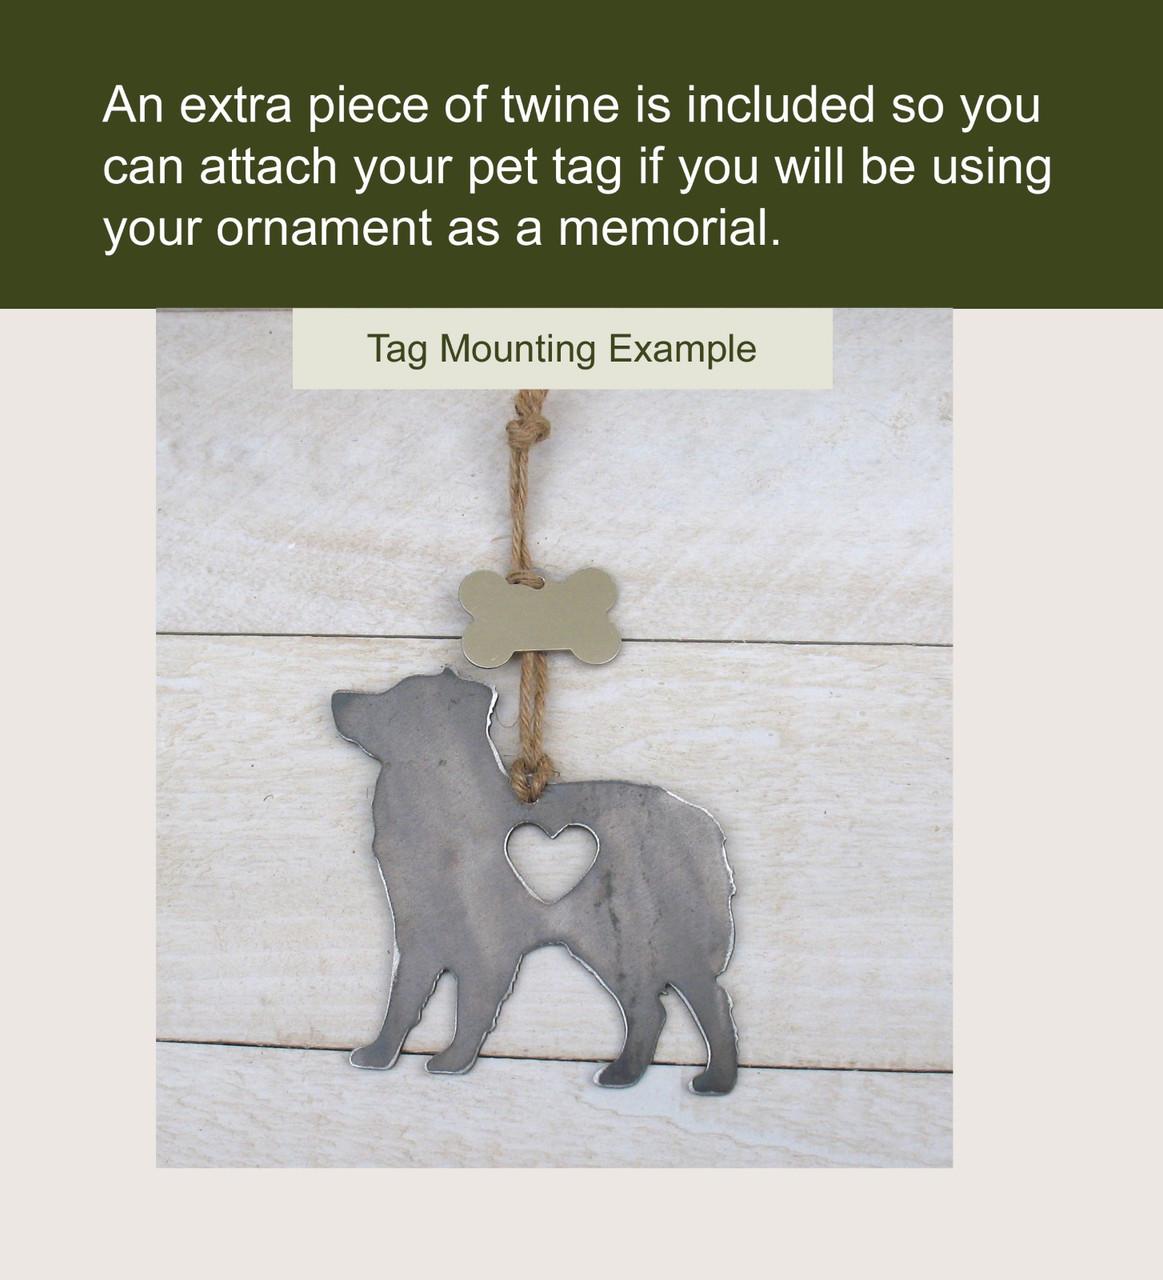 Beagle Dog Ornament 2 Pet Memorial W/ Angel Wings - Pet Loss Dog Sympathy Remembrance Gift - Metal Dog Christmas Ornament